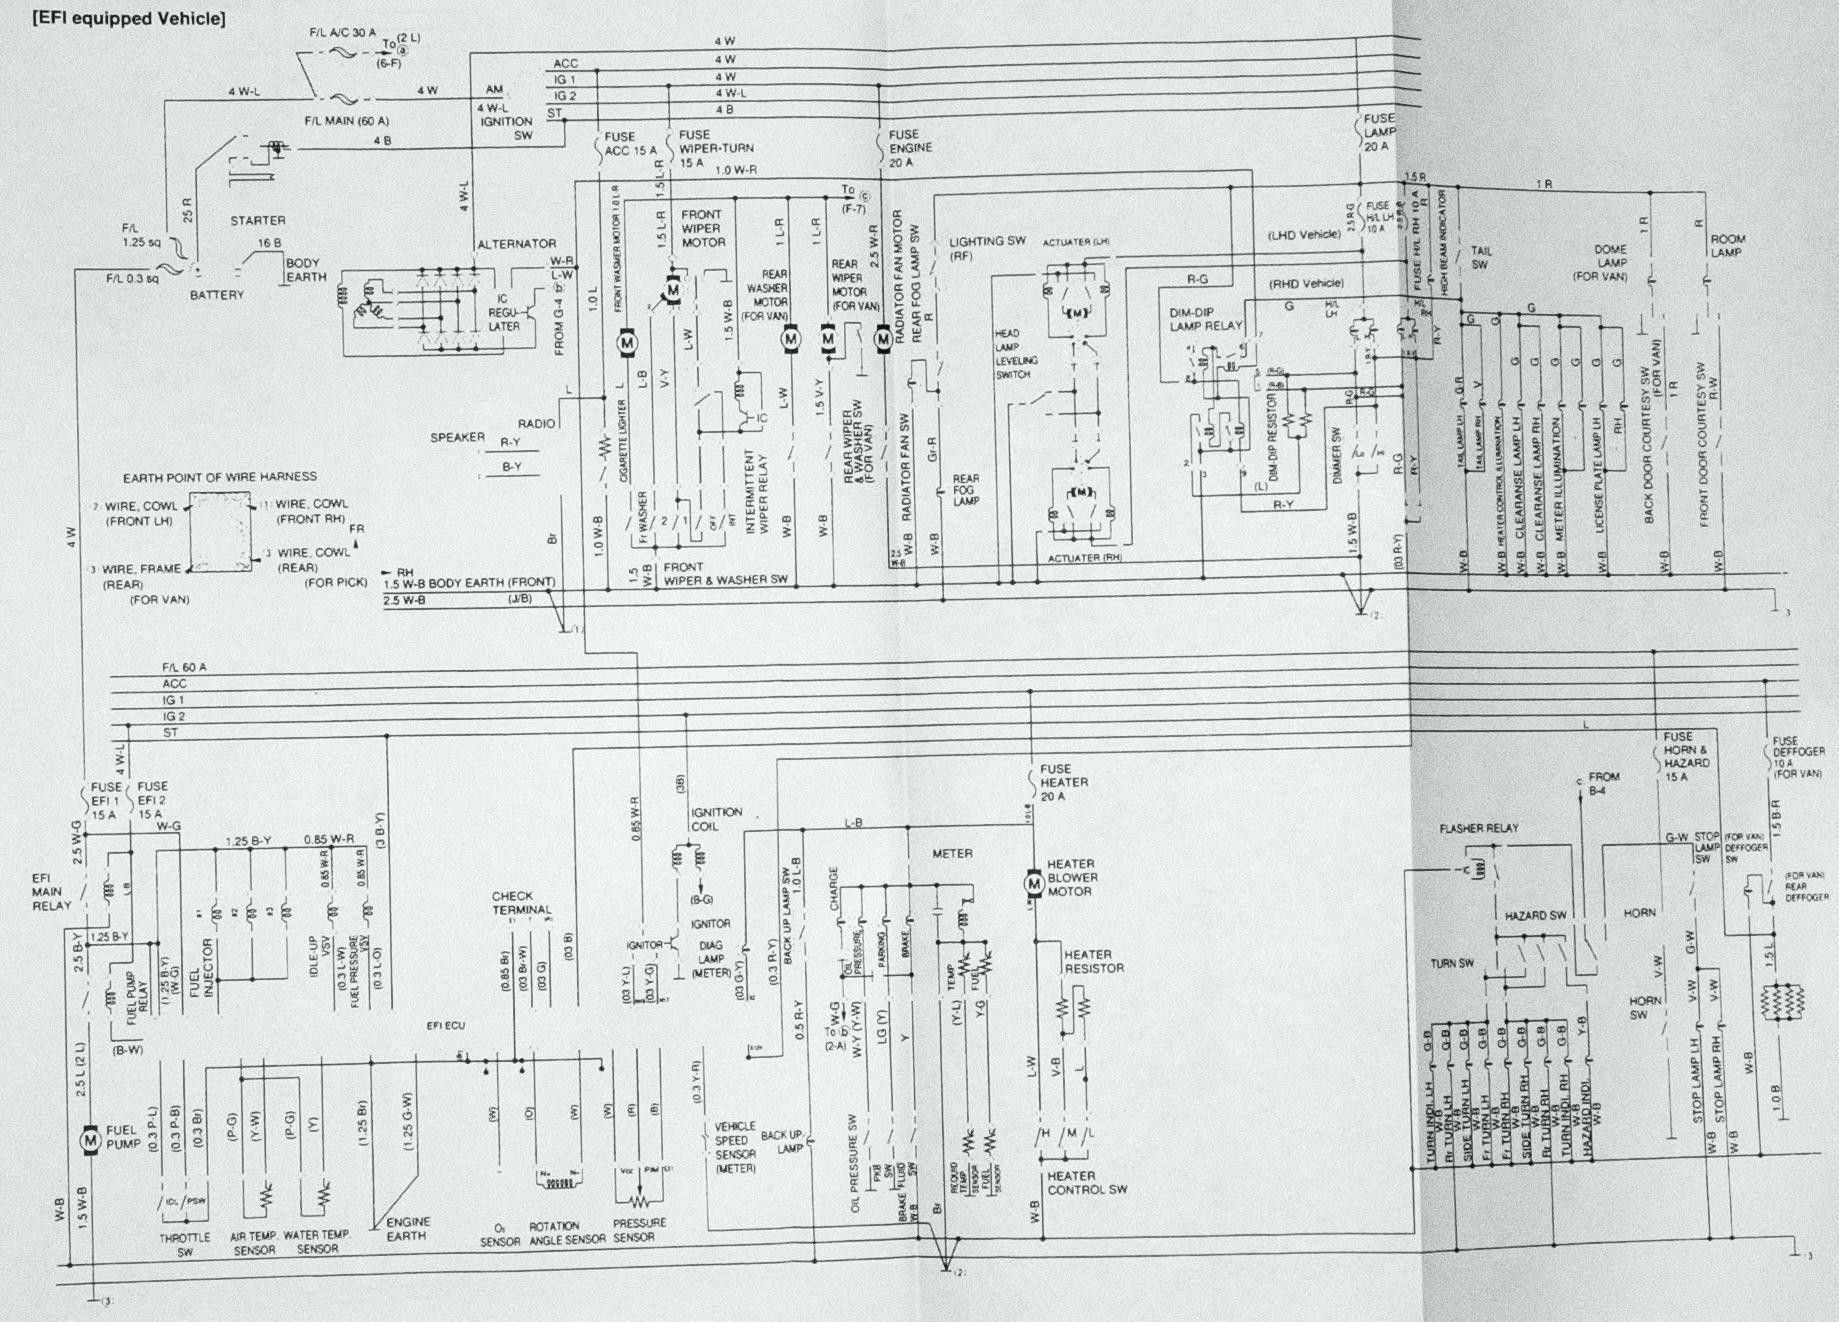 [EQHS_1162]  Unique Car Stereo Radio Wiring Diagram | Car stereo, Car stereo  installation, Unique cars | Jvc Kd S29 Wiring Diagram |  | Pinterest